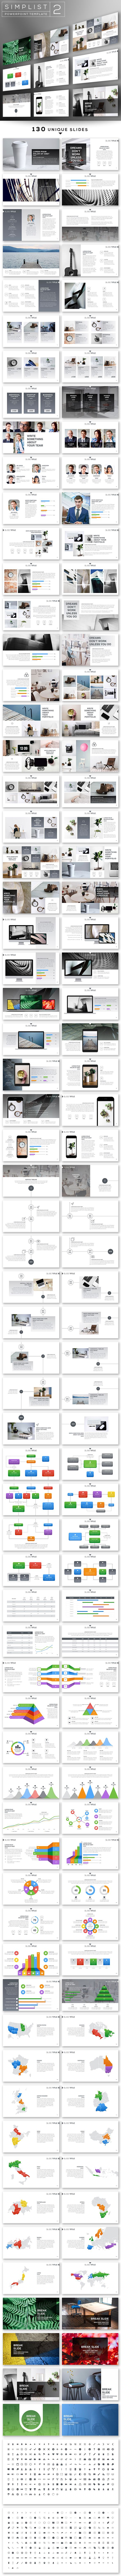 SIMPLIST 2 PowerPoint Template